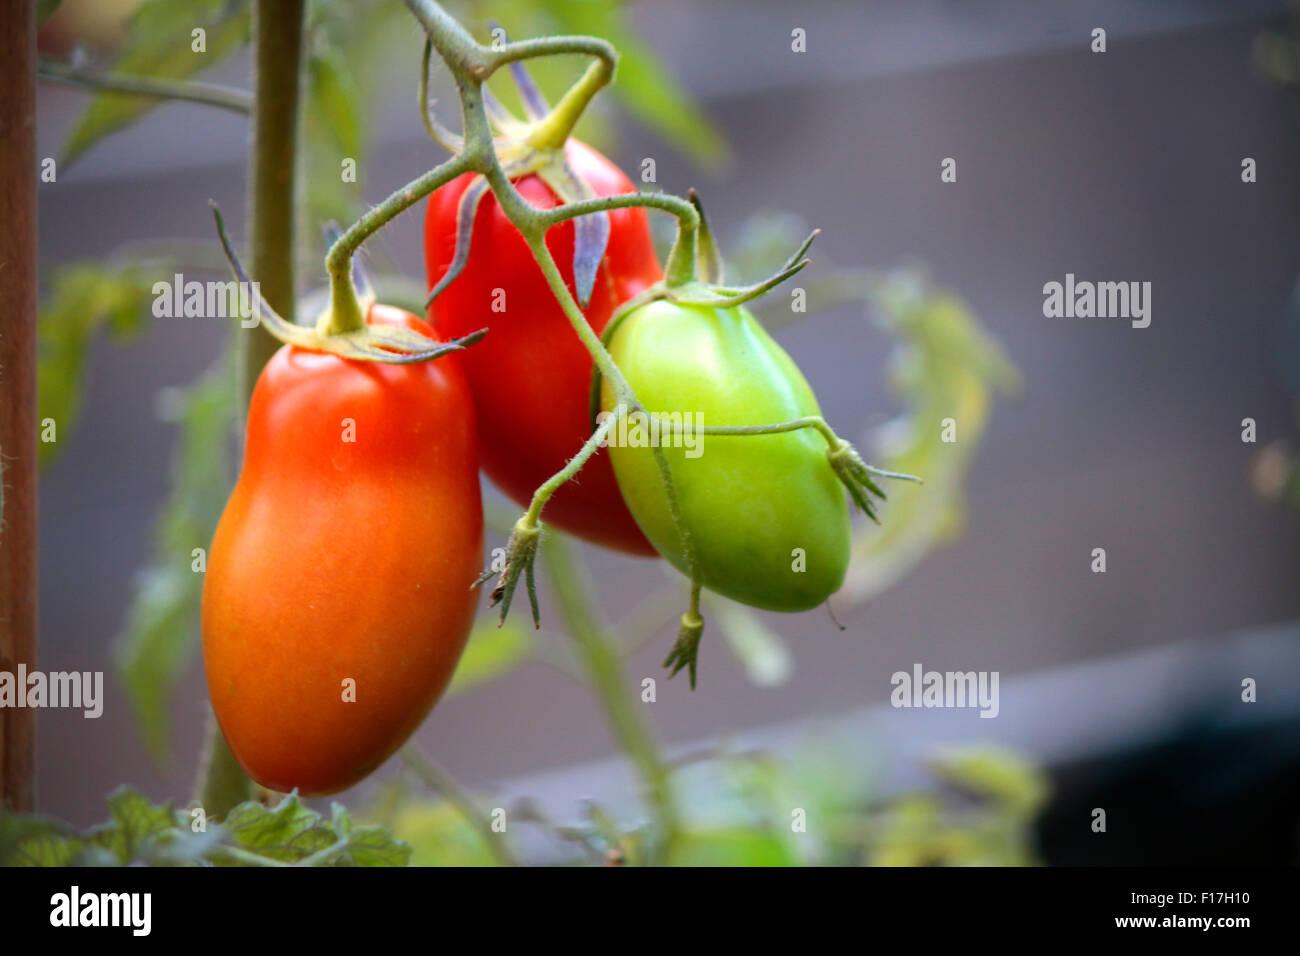 Tomaten, Garten, Berlin. Stock Photo